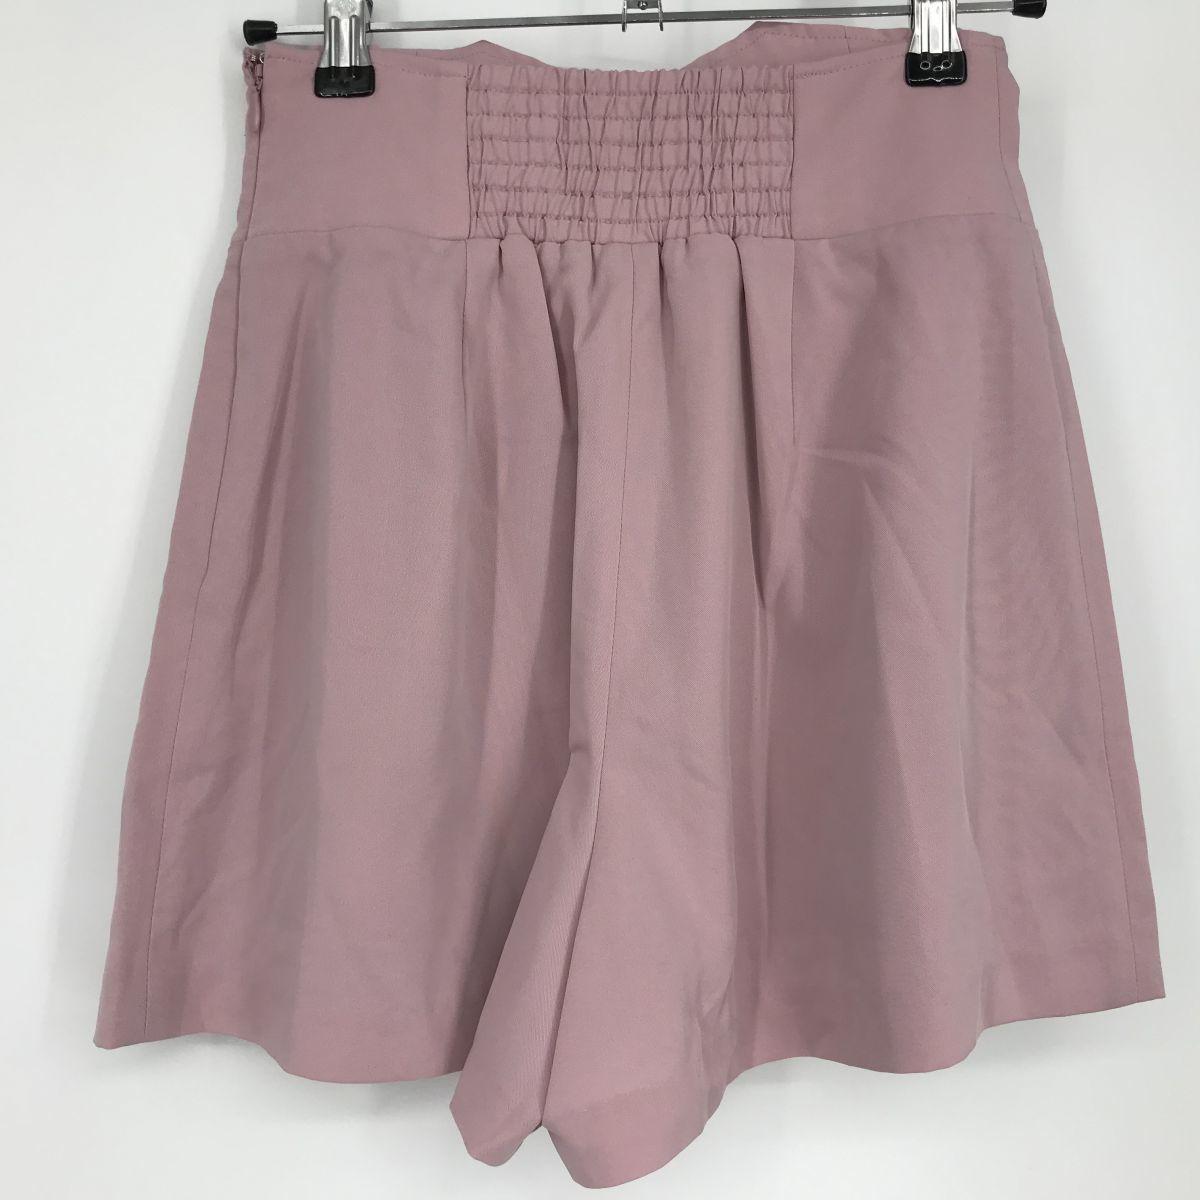 N518 rienda リエンダ キュロットスカート ベビーピンク Sサイズ  _画像2